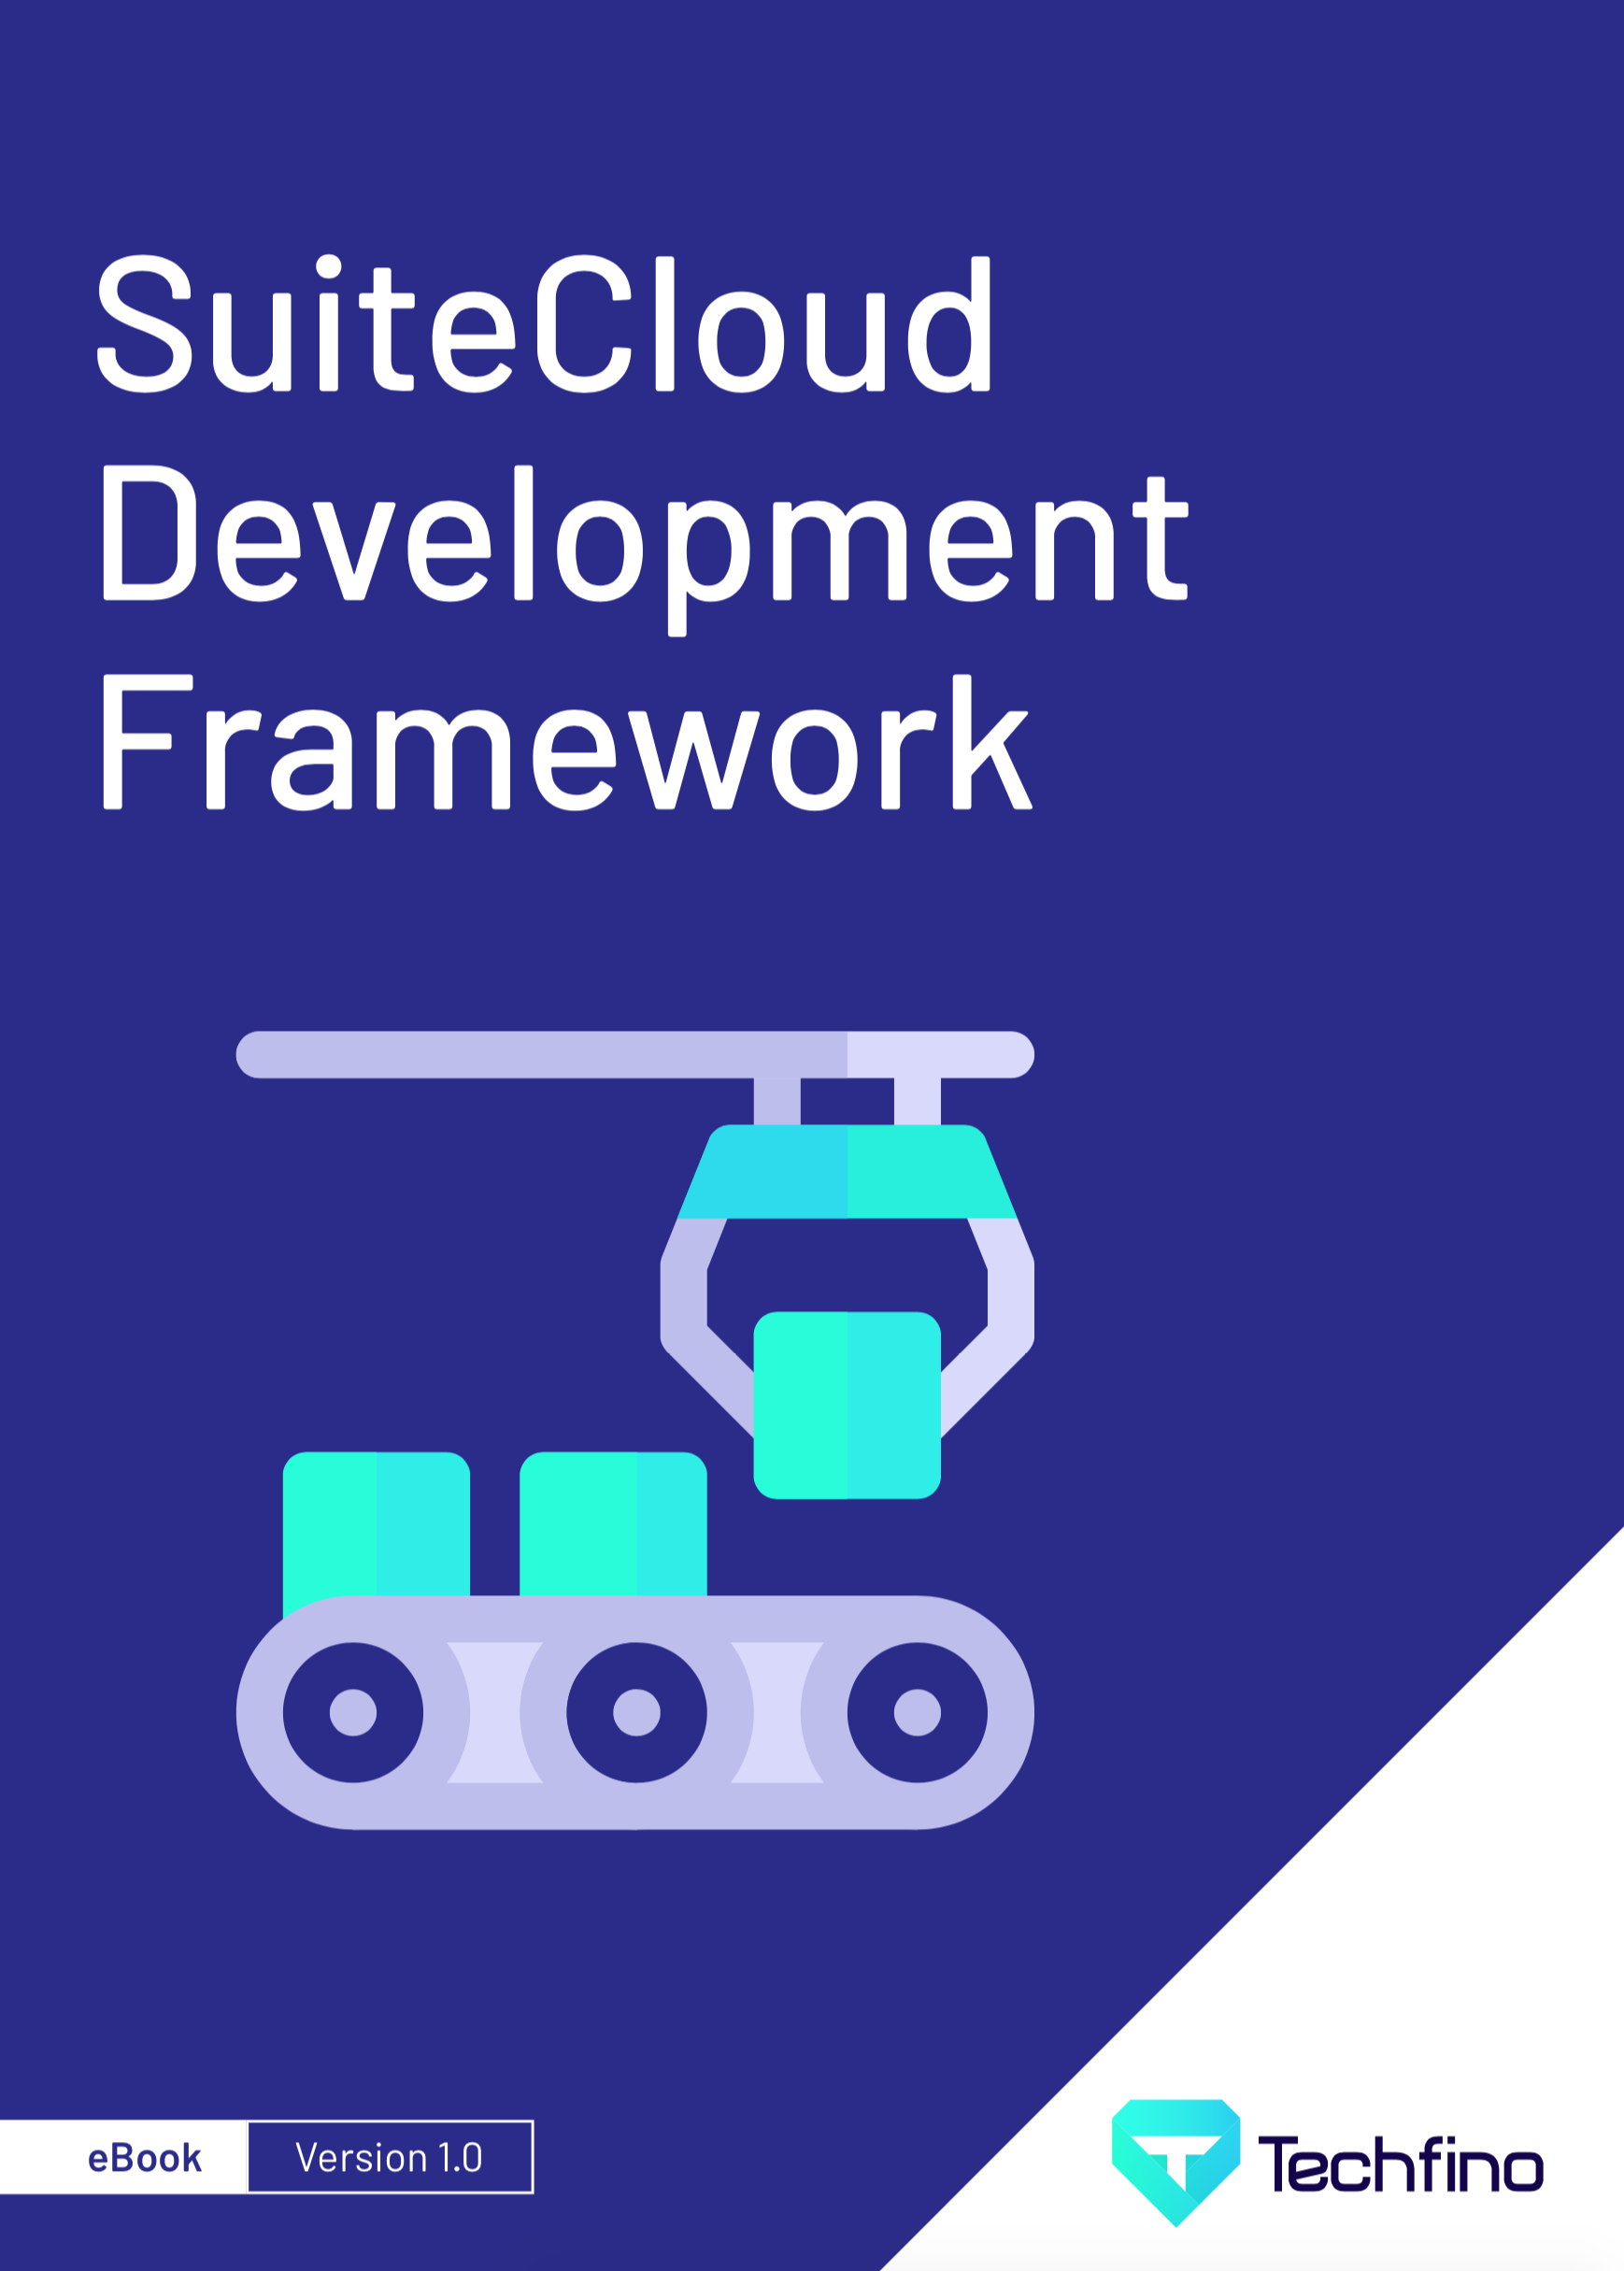 SuiteCloud Development Framework eBook